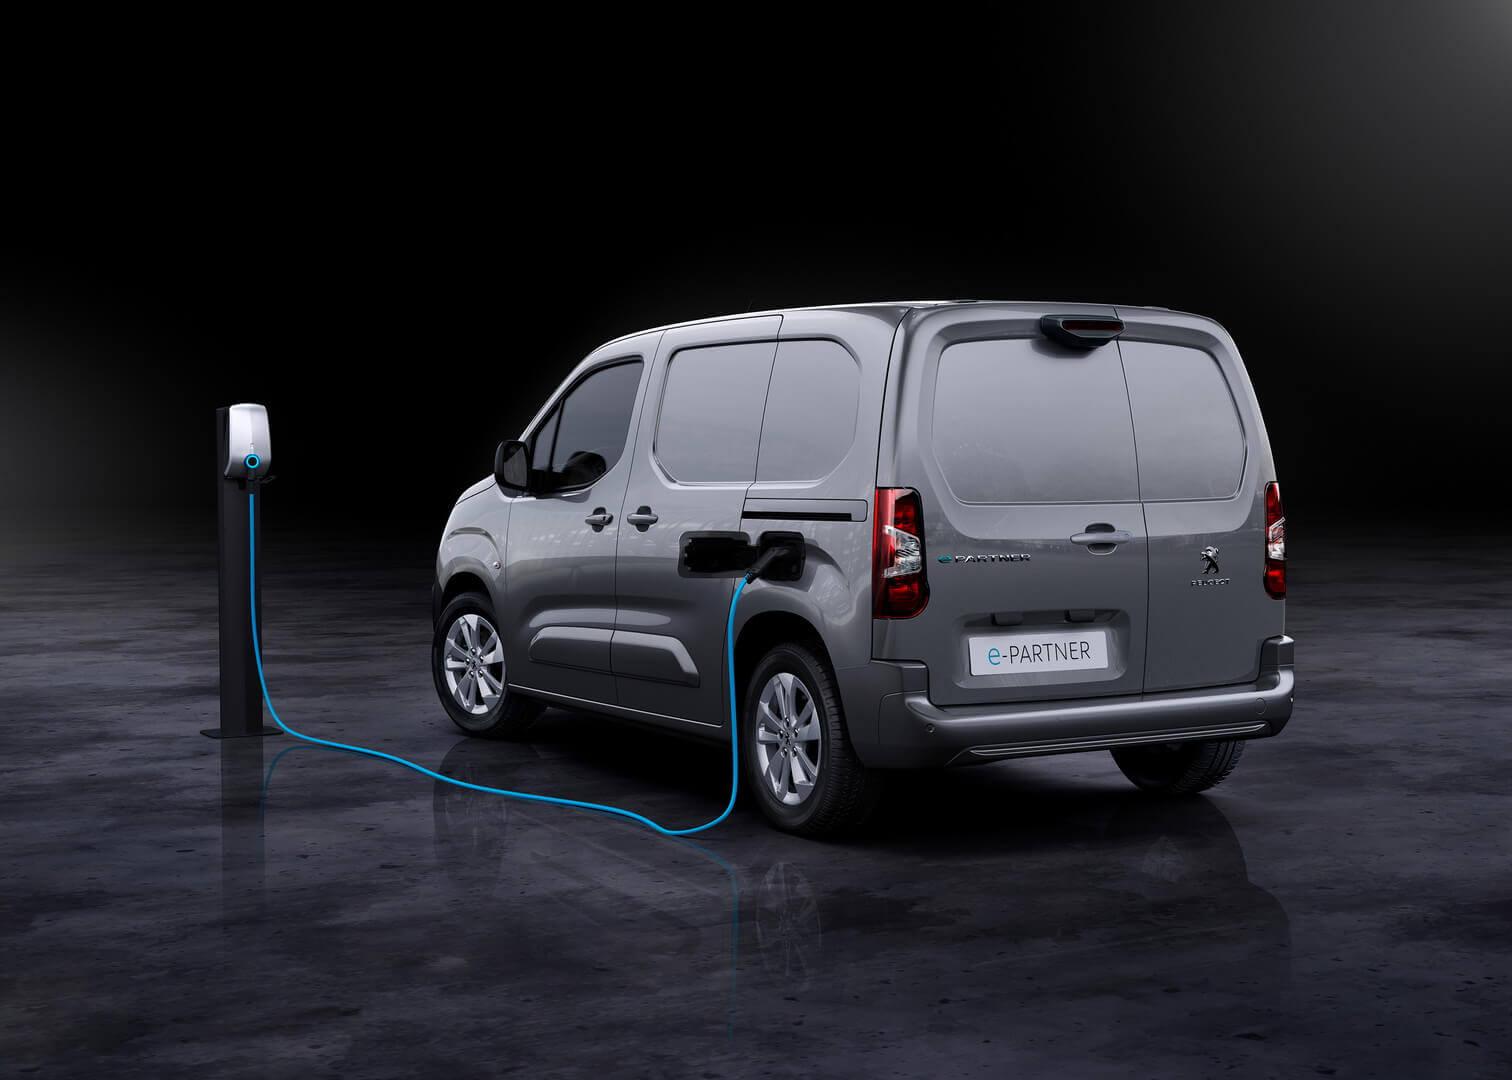 Компактный электрофургон Peugeot e-Partner с запасом хода до 275 км